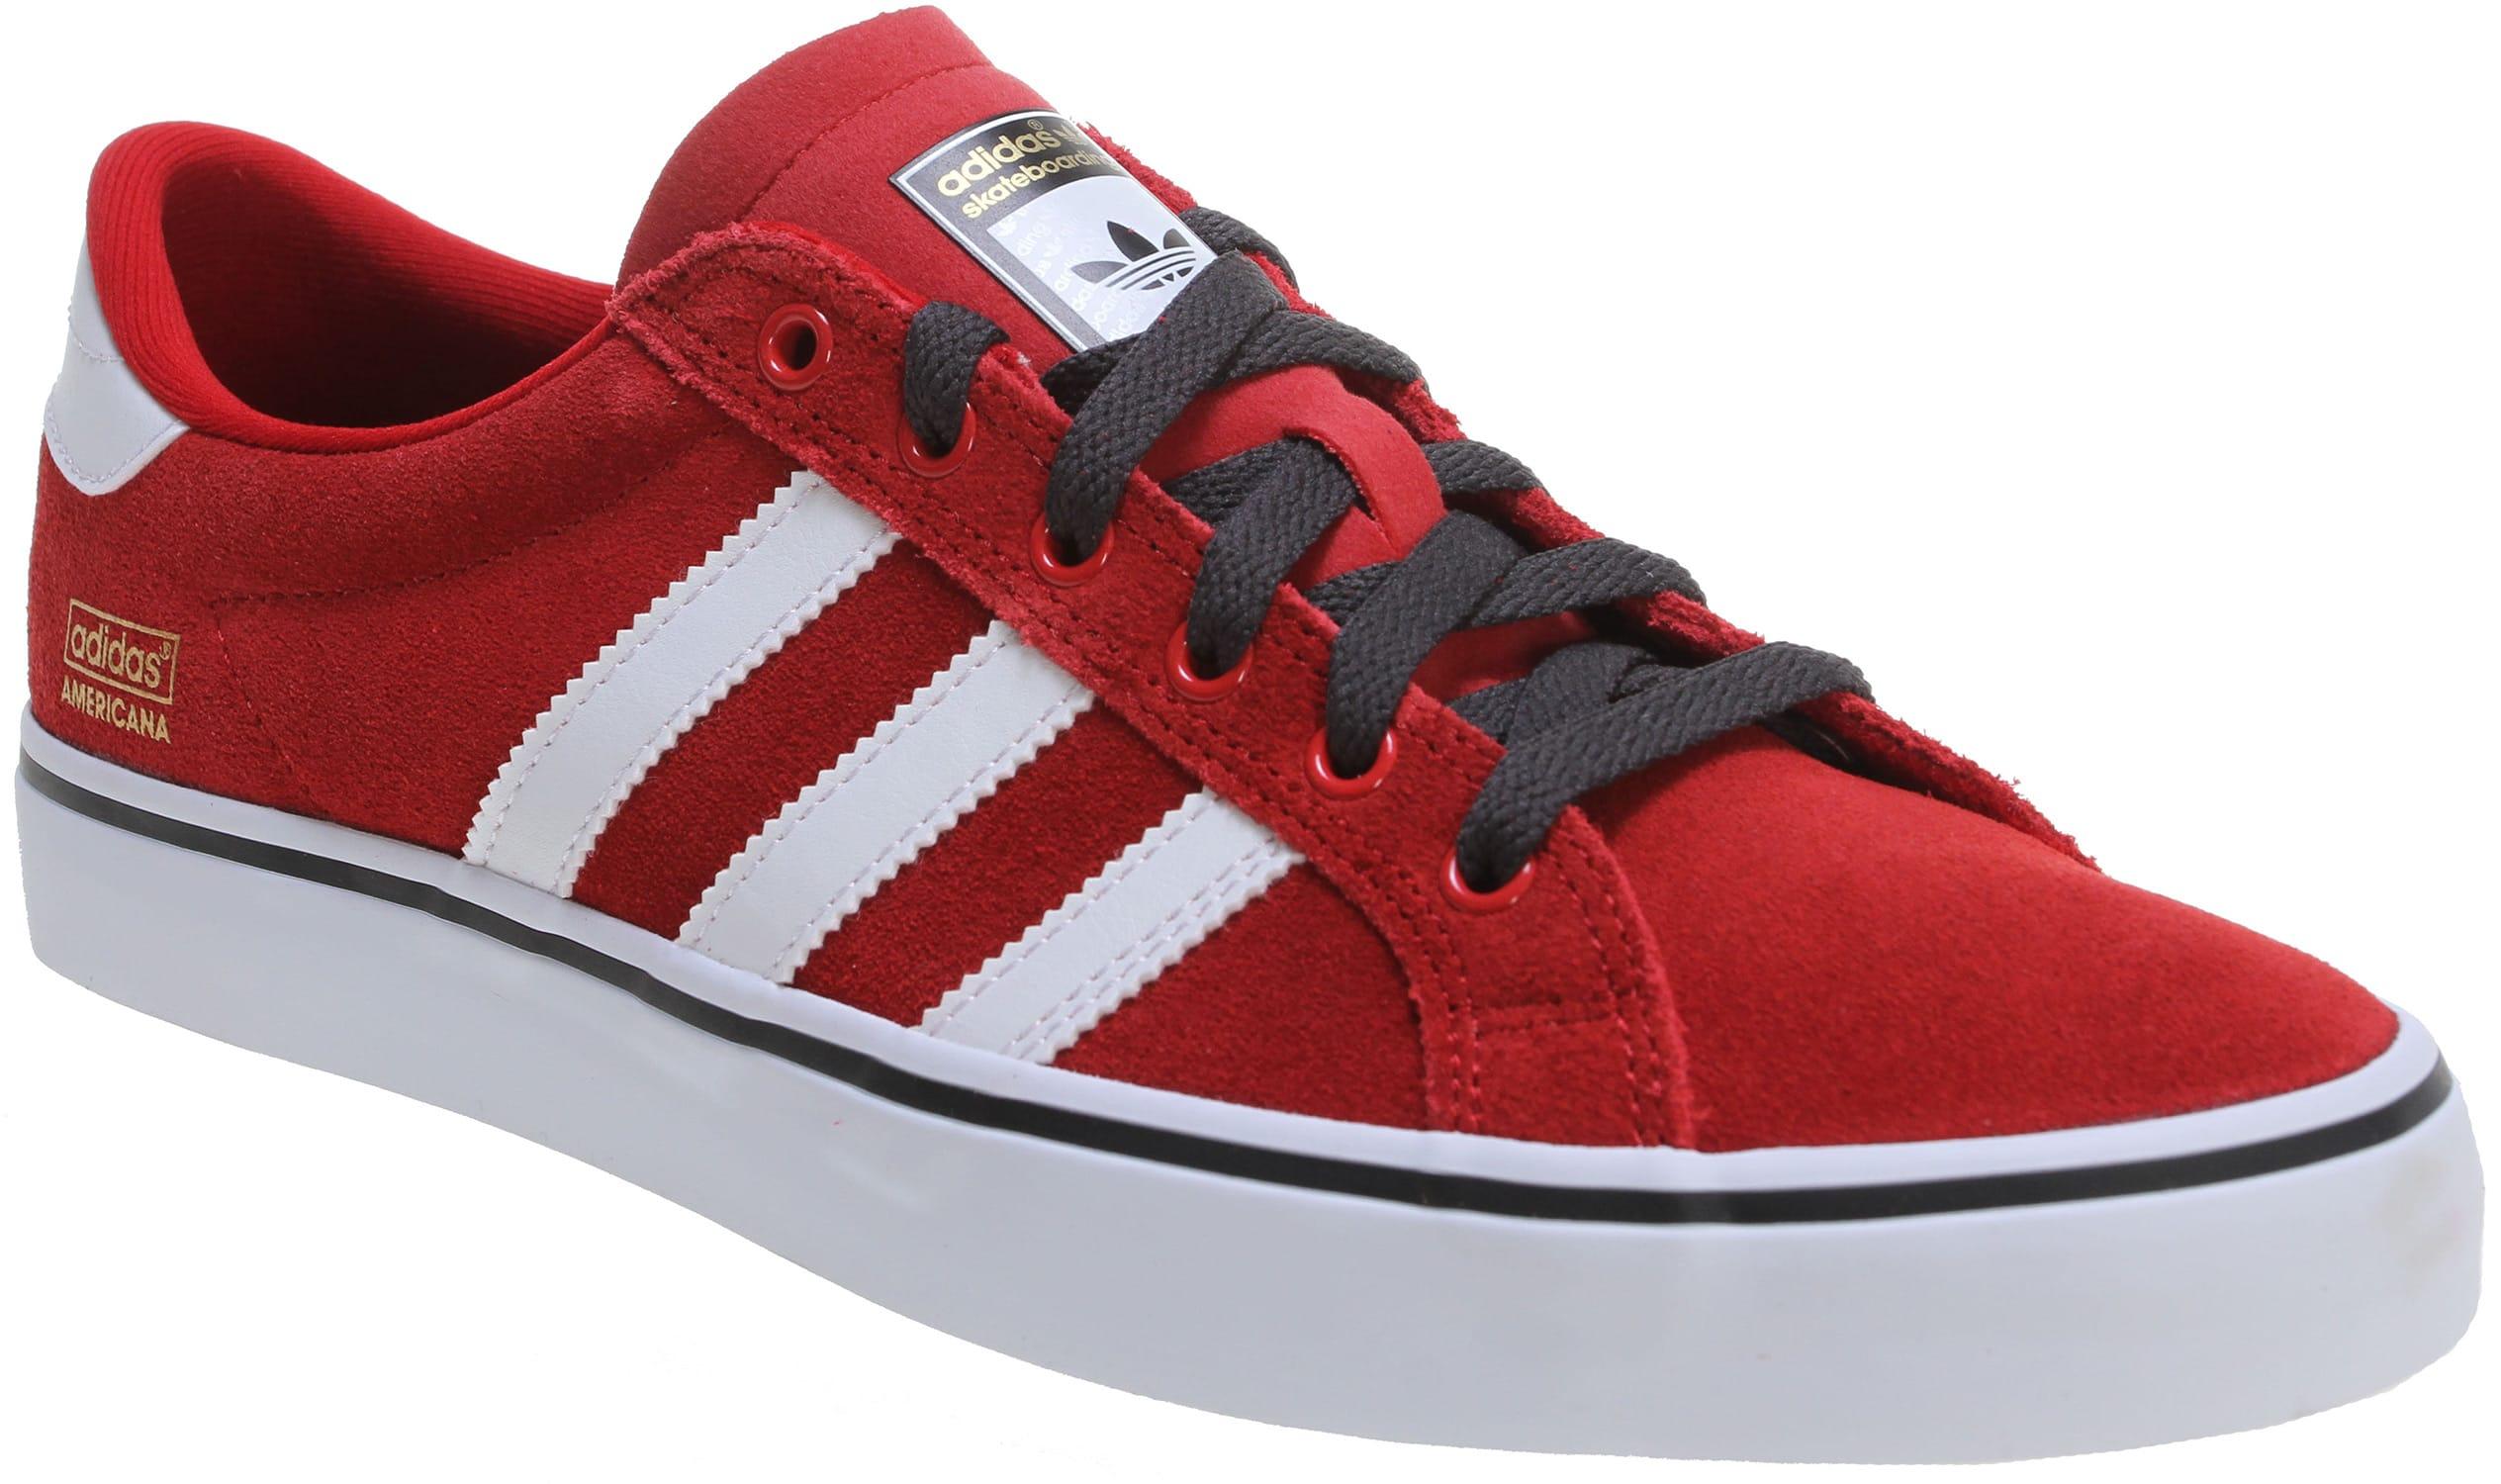 buy online 41230 cd914 Adidas Americana Low Skate Shoes - thumbnail 2